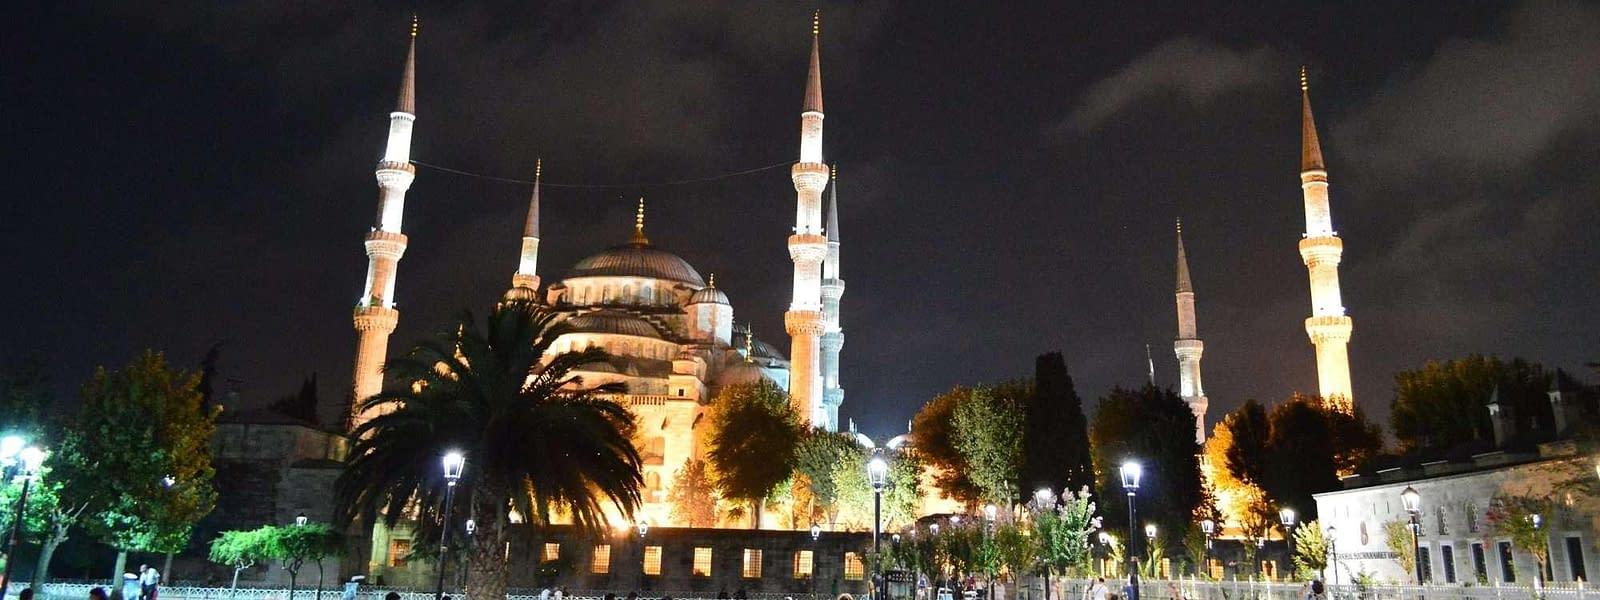 Iconic Blue Mosque Istanbul, Turkey